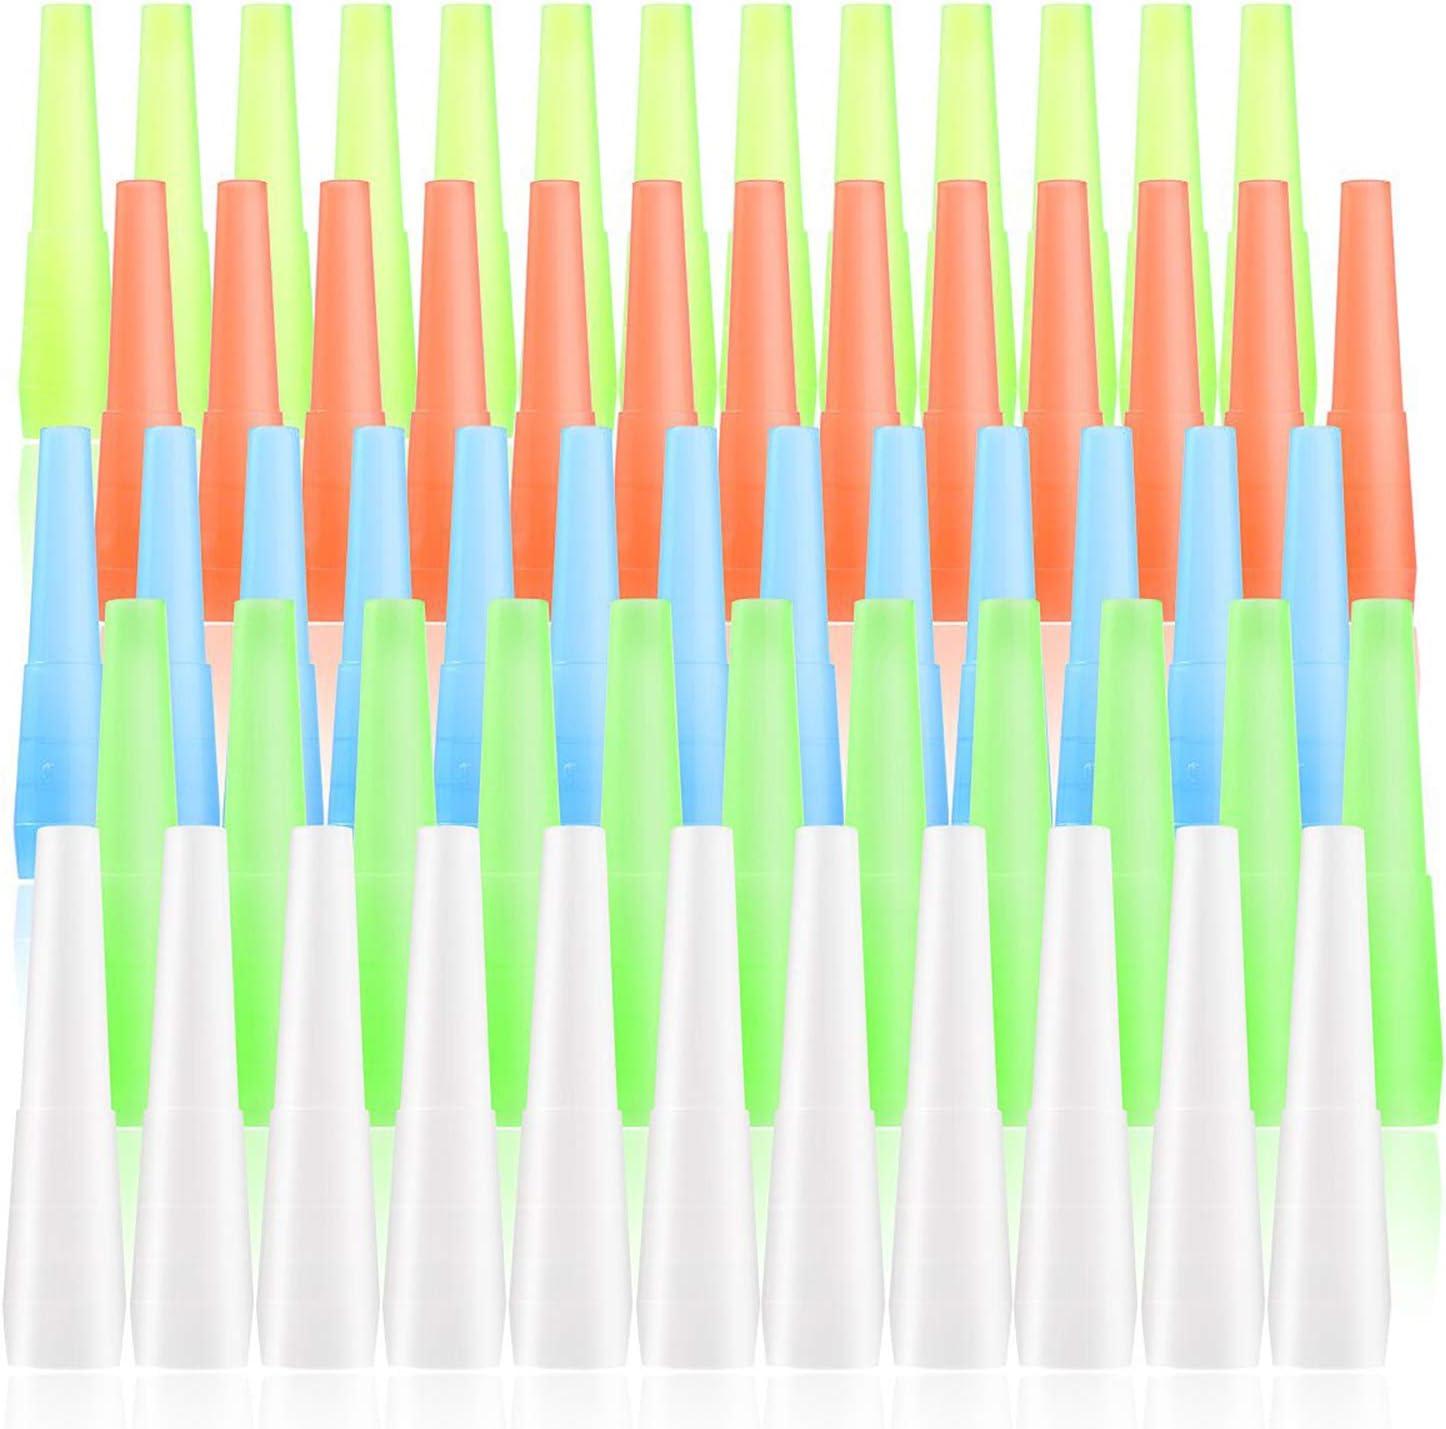 Colmanda Boquillas Desechables, 200 Piezas Boquillas de Higiene Envasadas Individualmente, Boquillas para Cachimba o Shisha, para Pipa de Agua, Accesorio Universal, Color Aleatorio